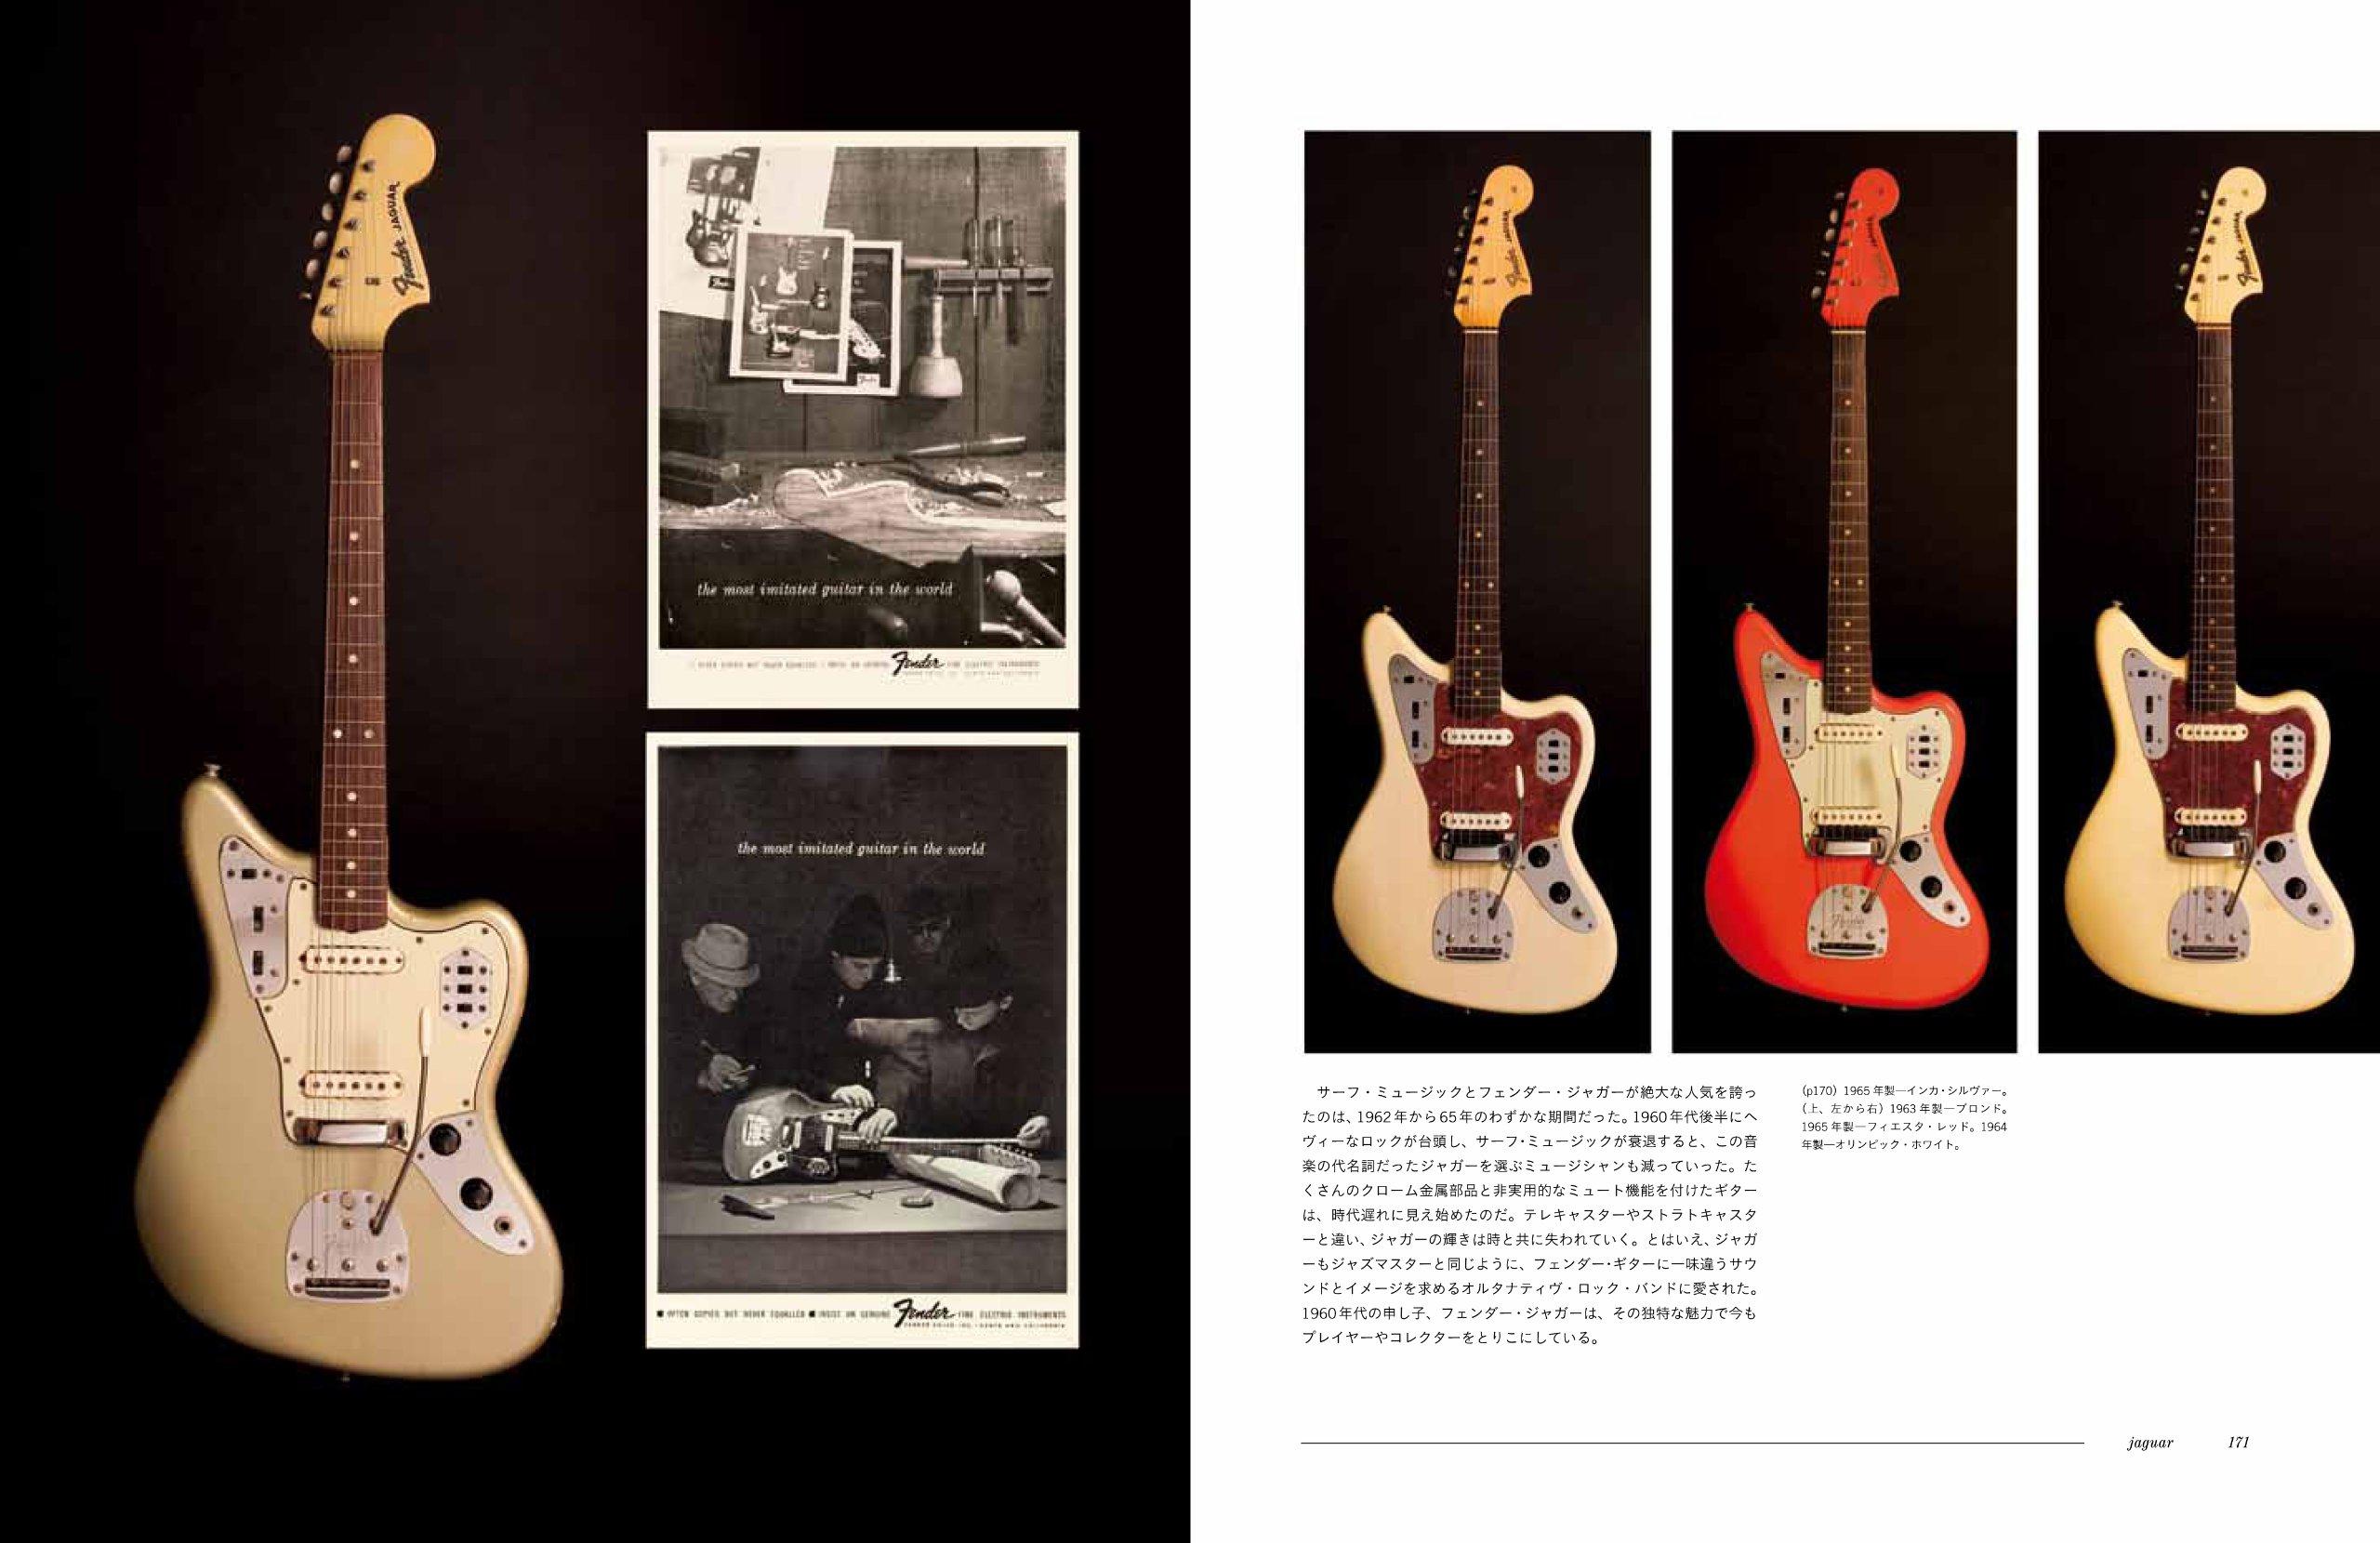 fender collection photo magazine guide book electric guitar vintage 1940 39 s 50 39 s ebay. Black Bedroom Furniture Sets. Home Design Ideas